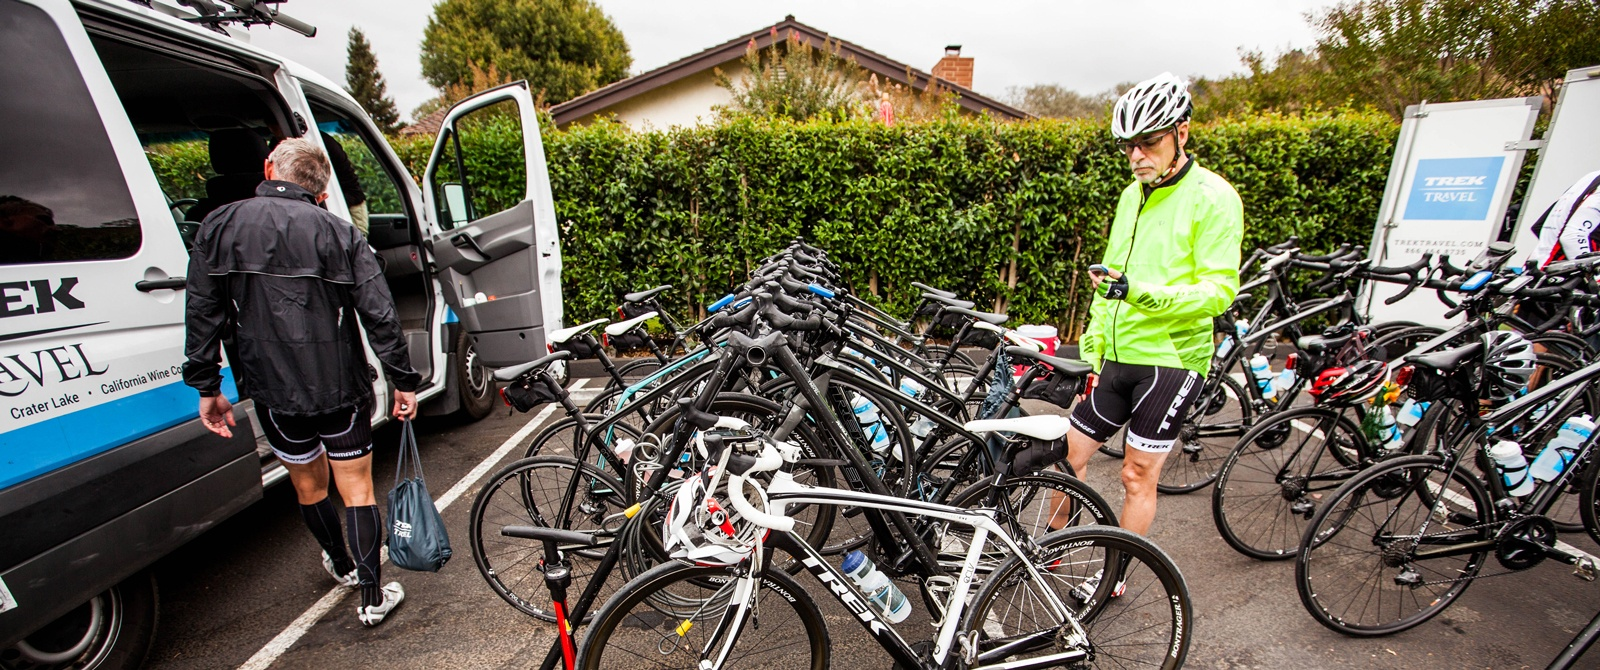 Tour De France Legendary Climbs Book